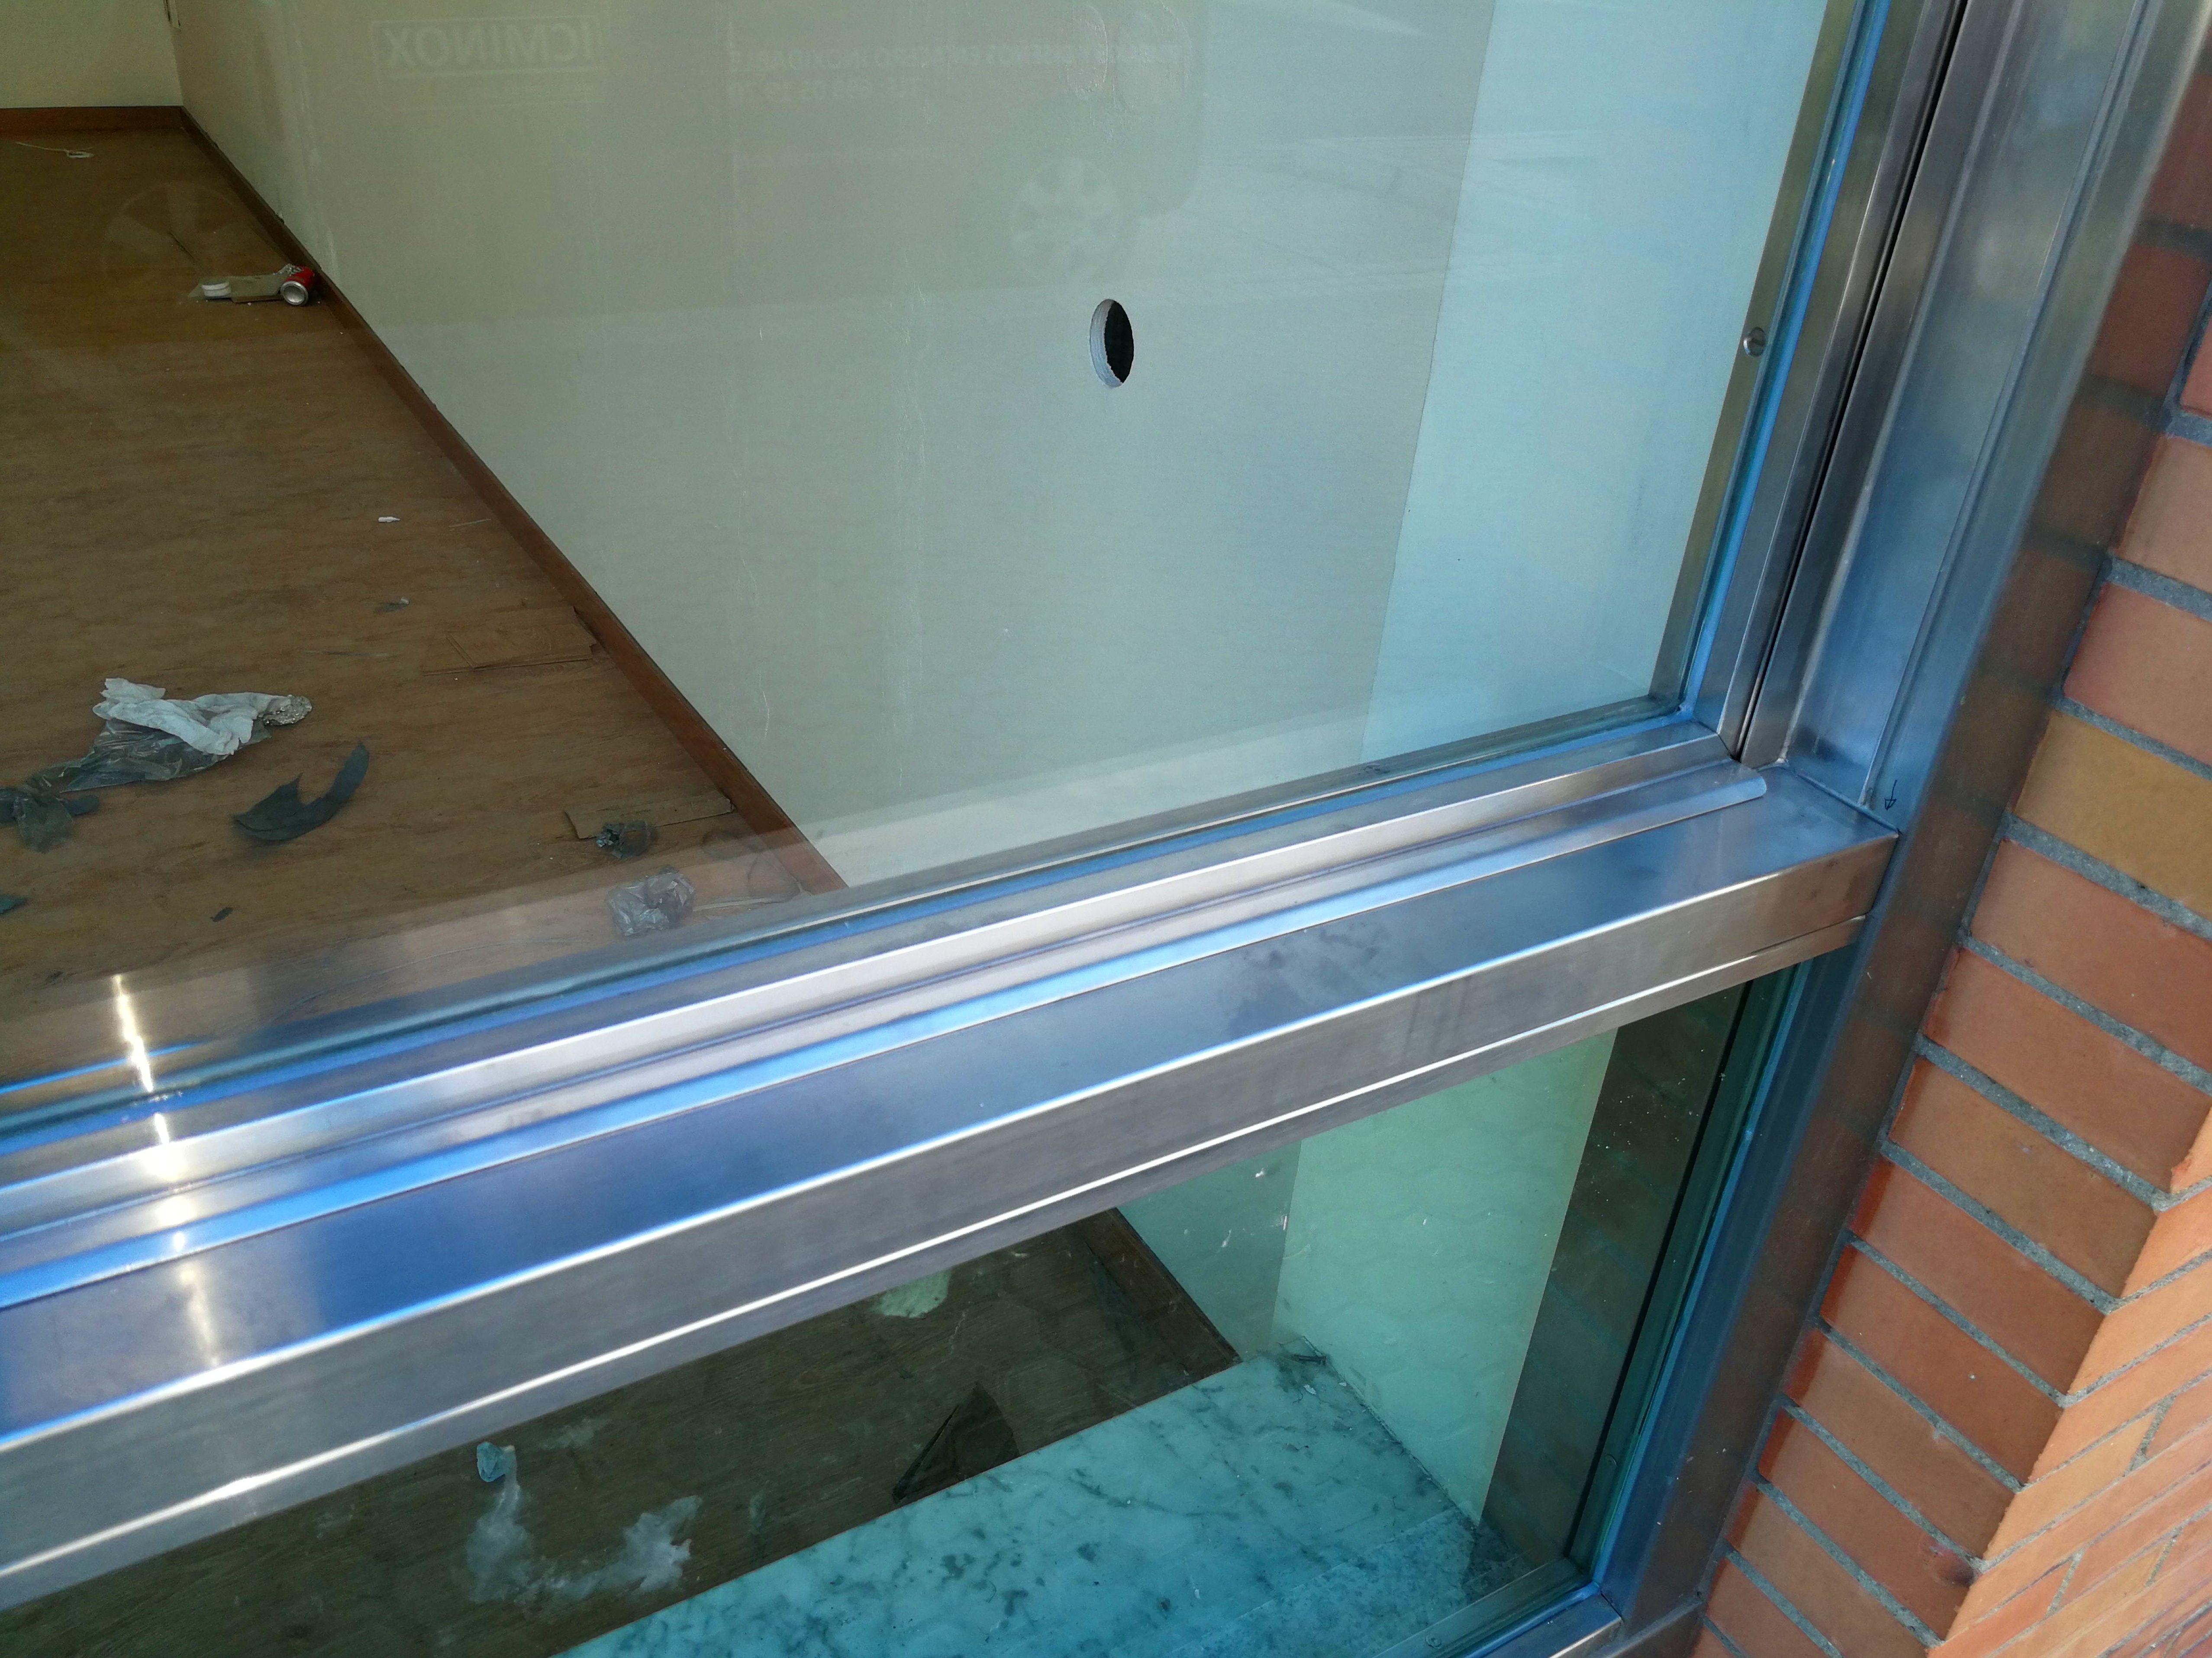 Ventana guillotina de acero inoxidable y vidrio montada en escaparate comercial